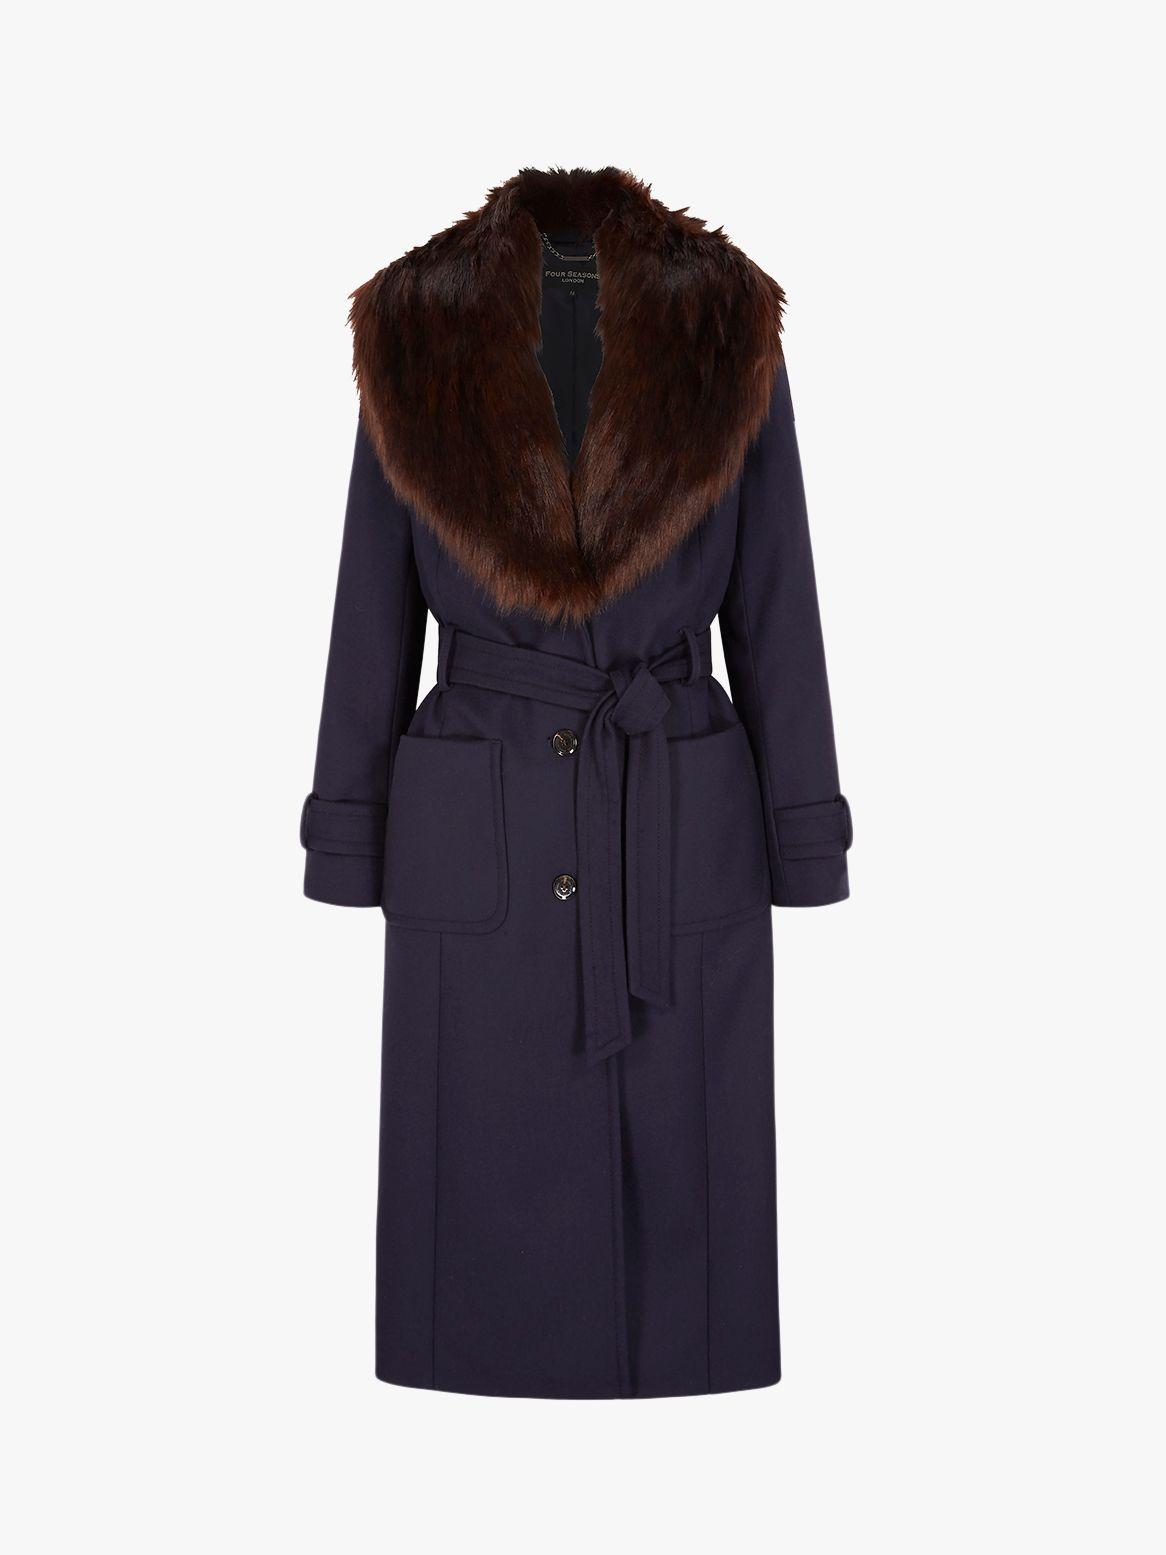 Four Seasons Four Seasons Faux Fur Collar Coat, Blue